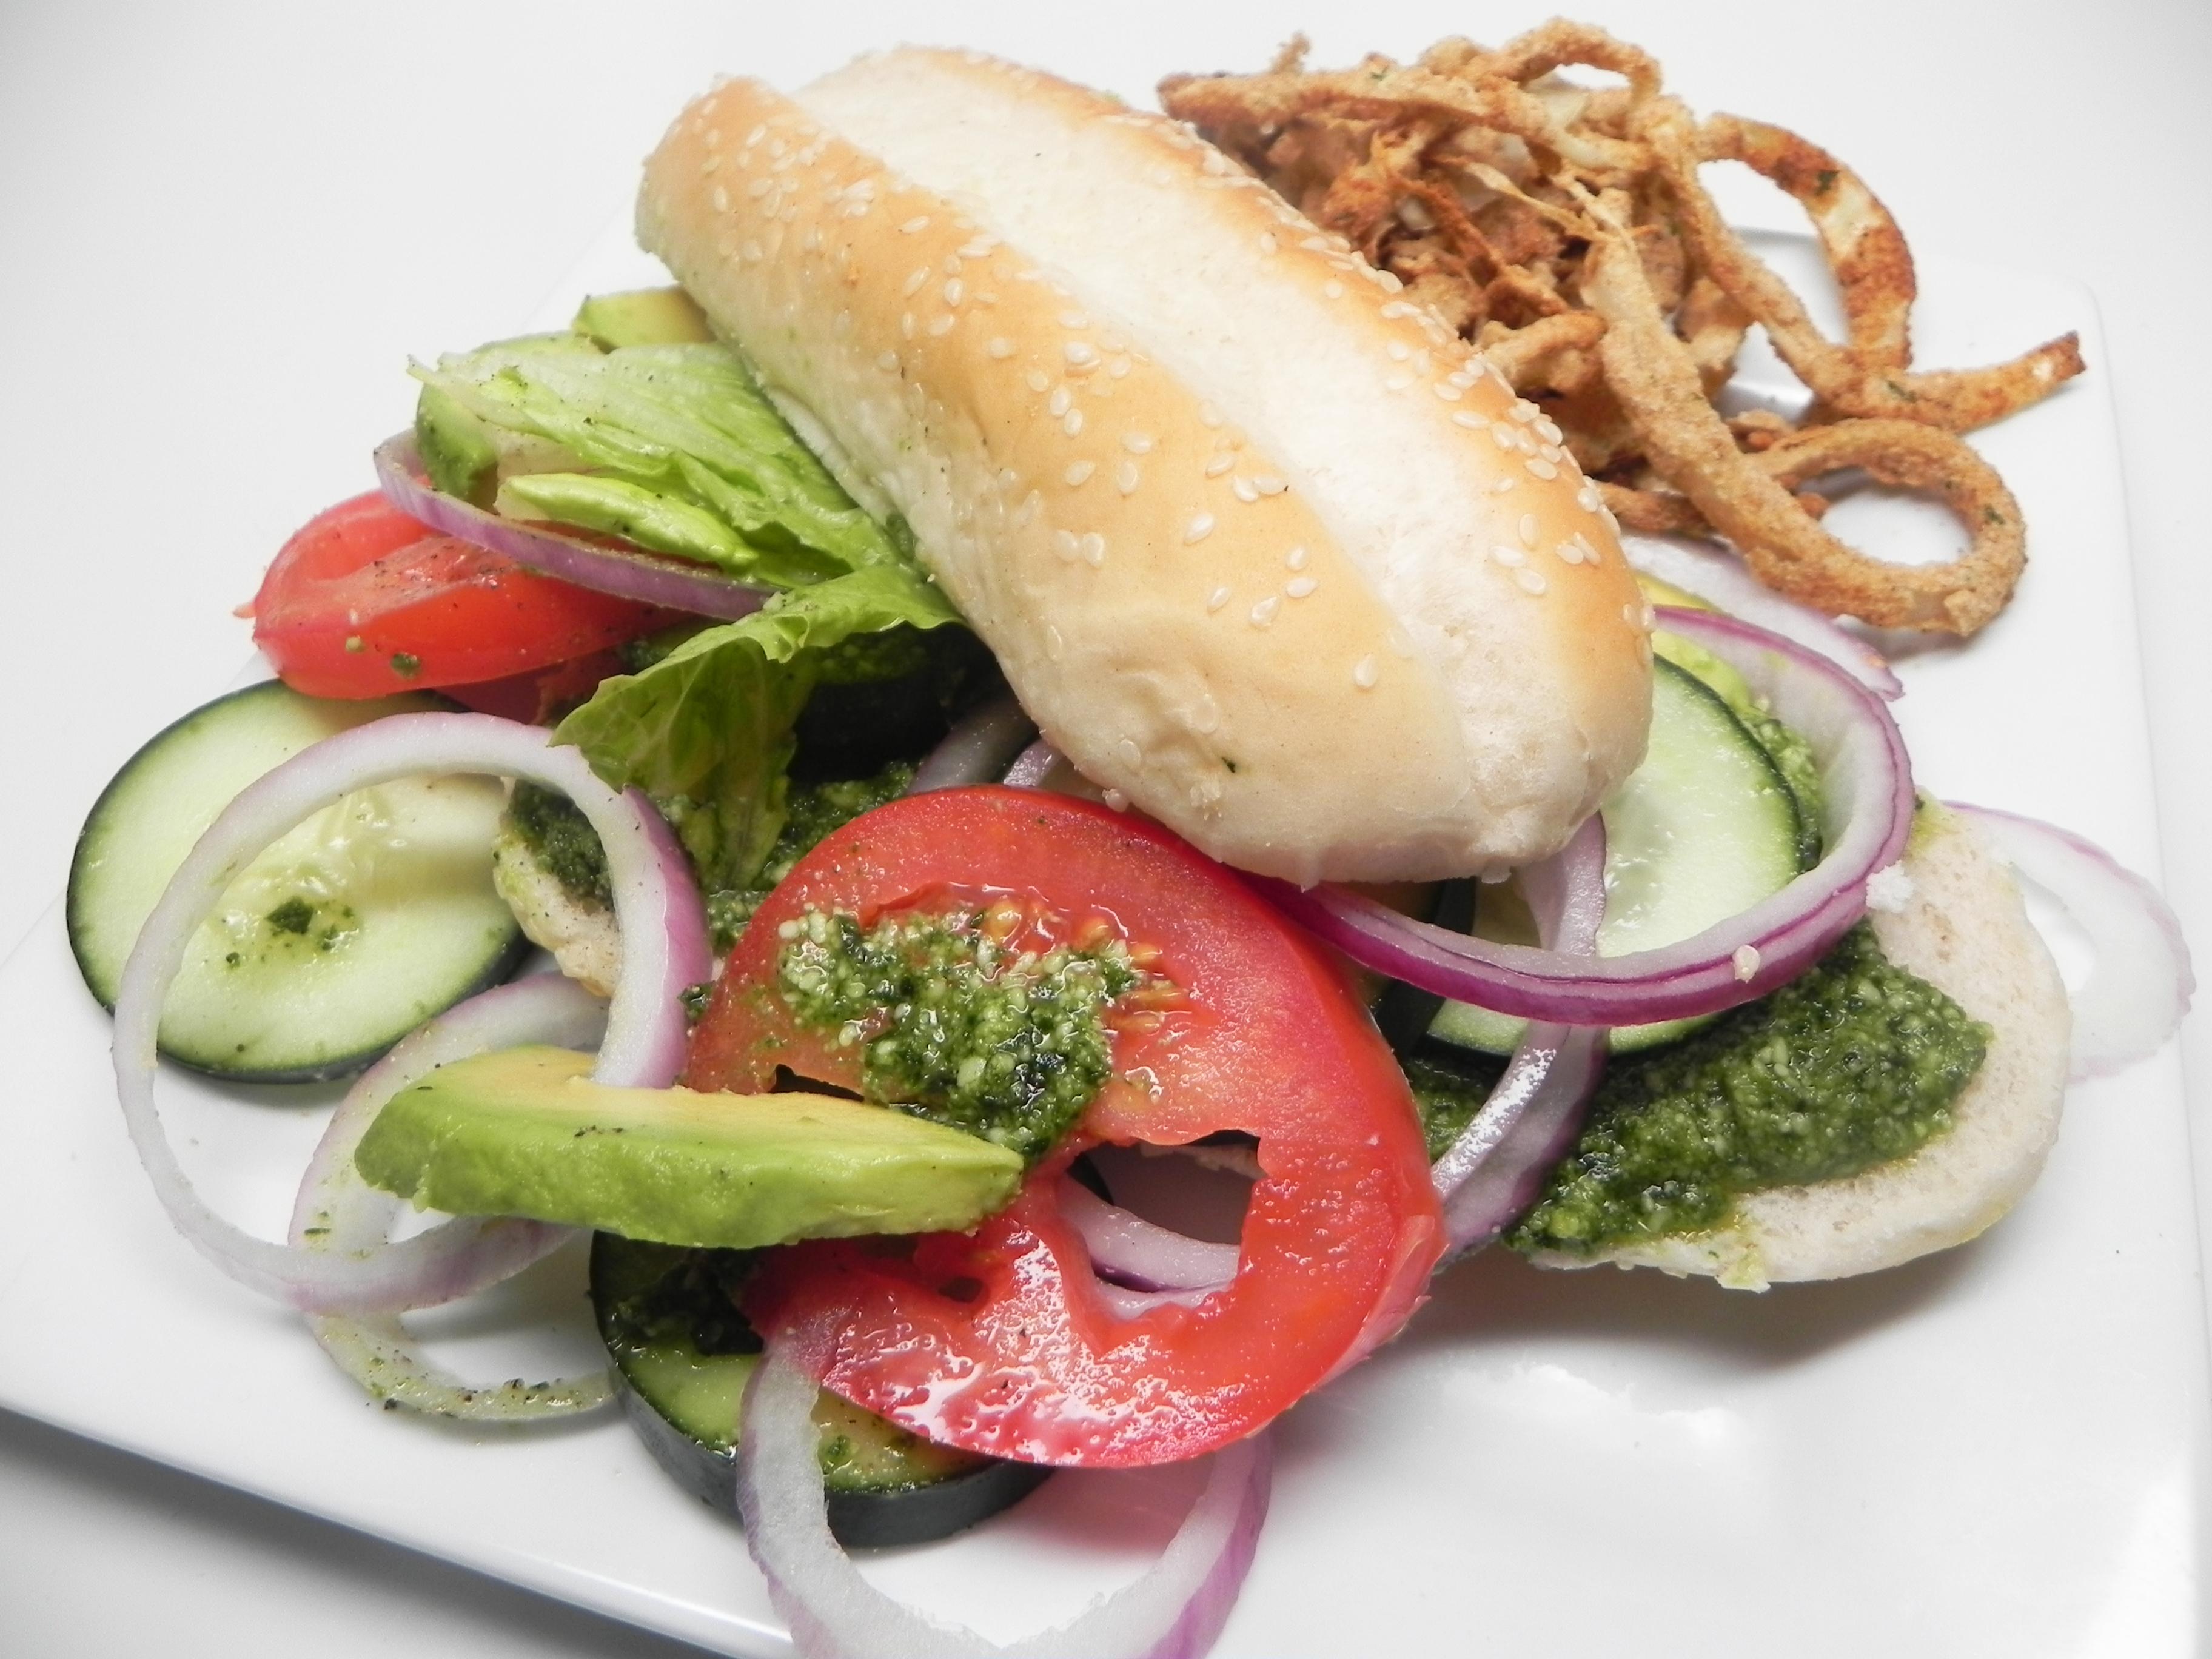 Tasty Vegan Guacamole Sandwich